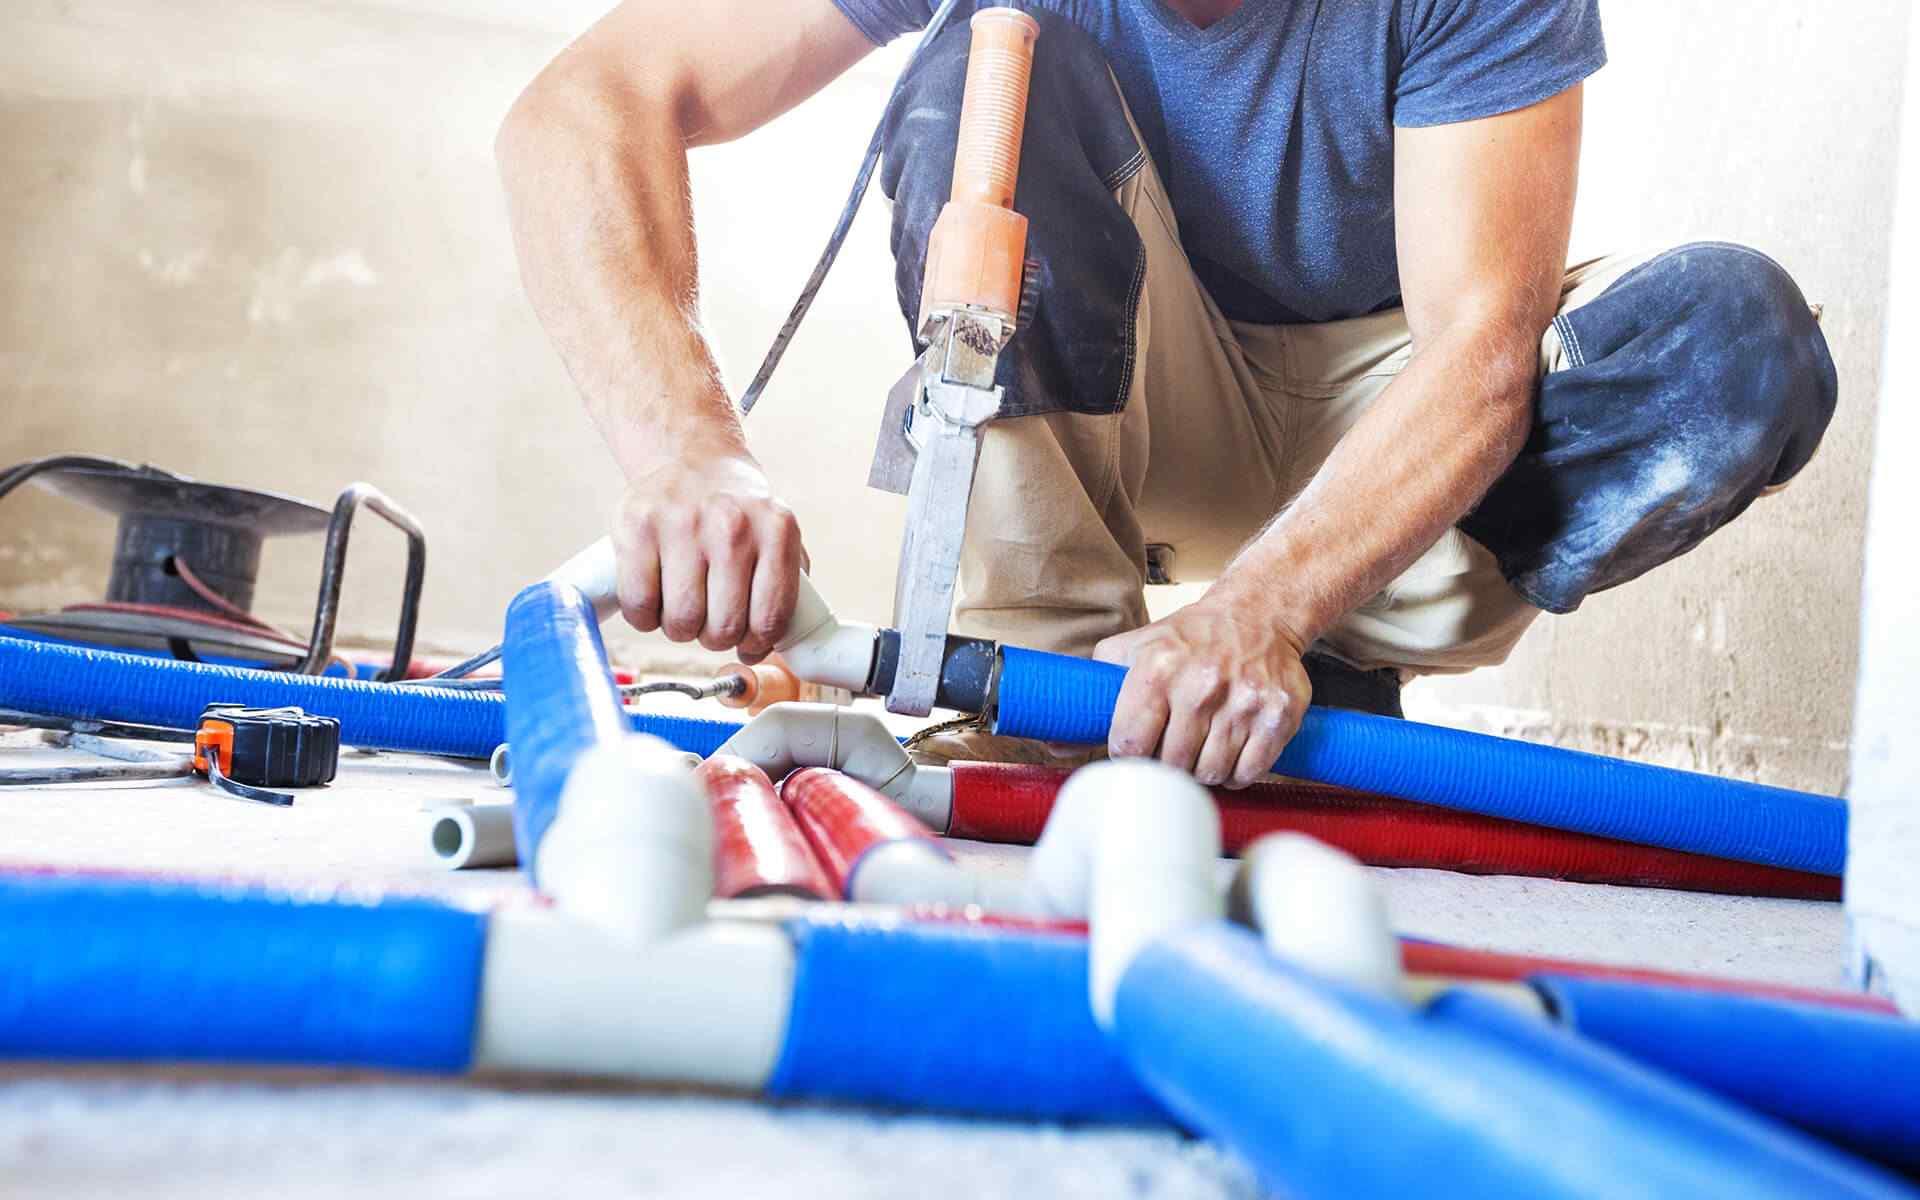 Bronx plumbing company - EmergencySewers.com